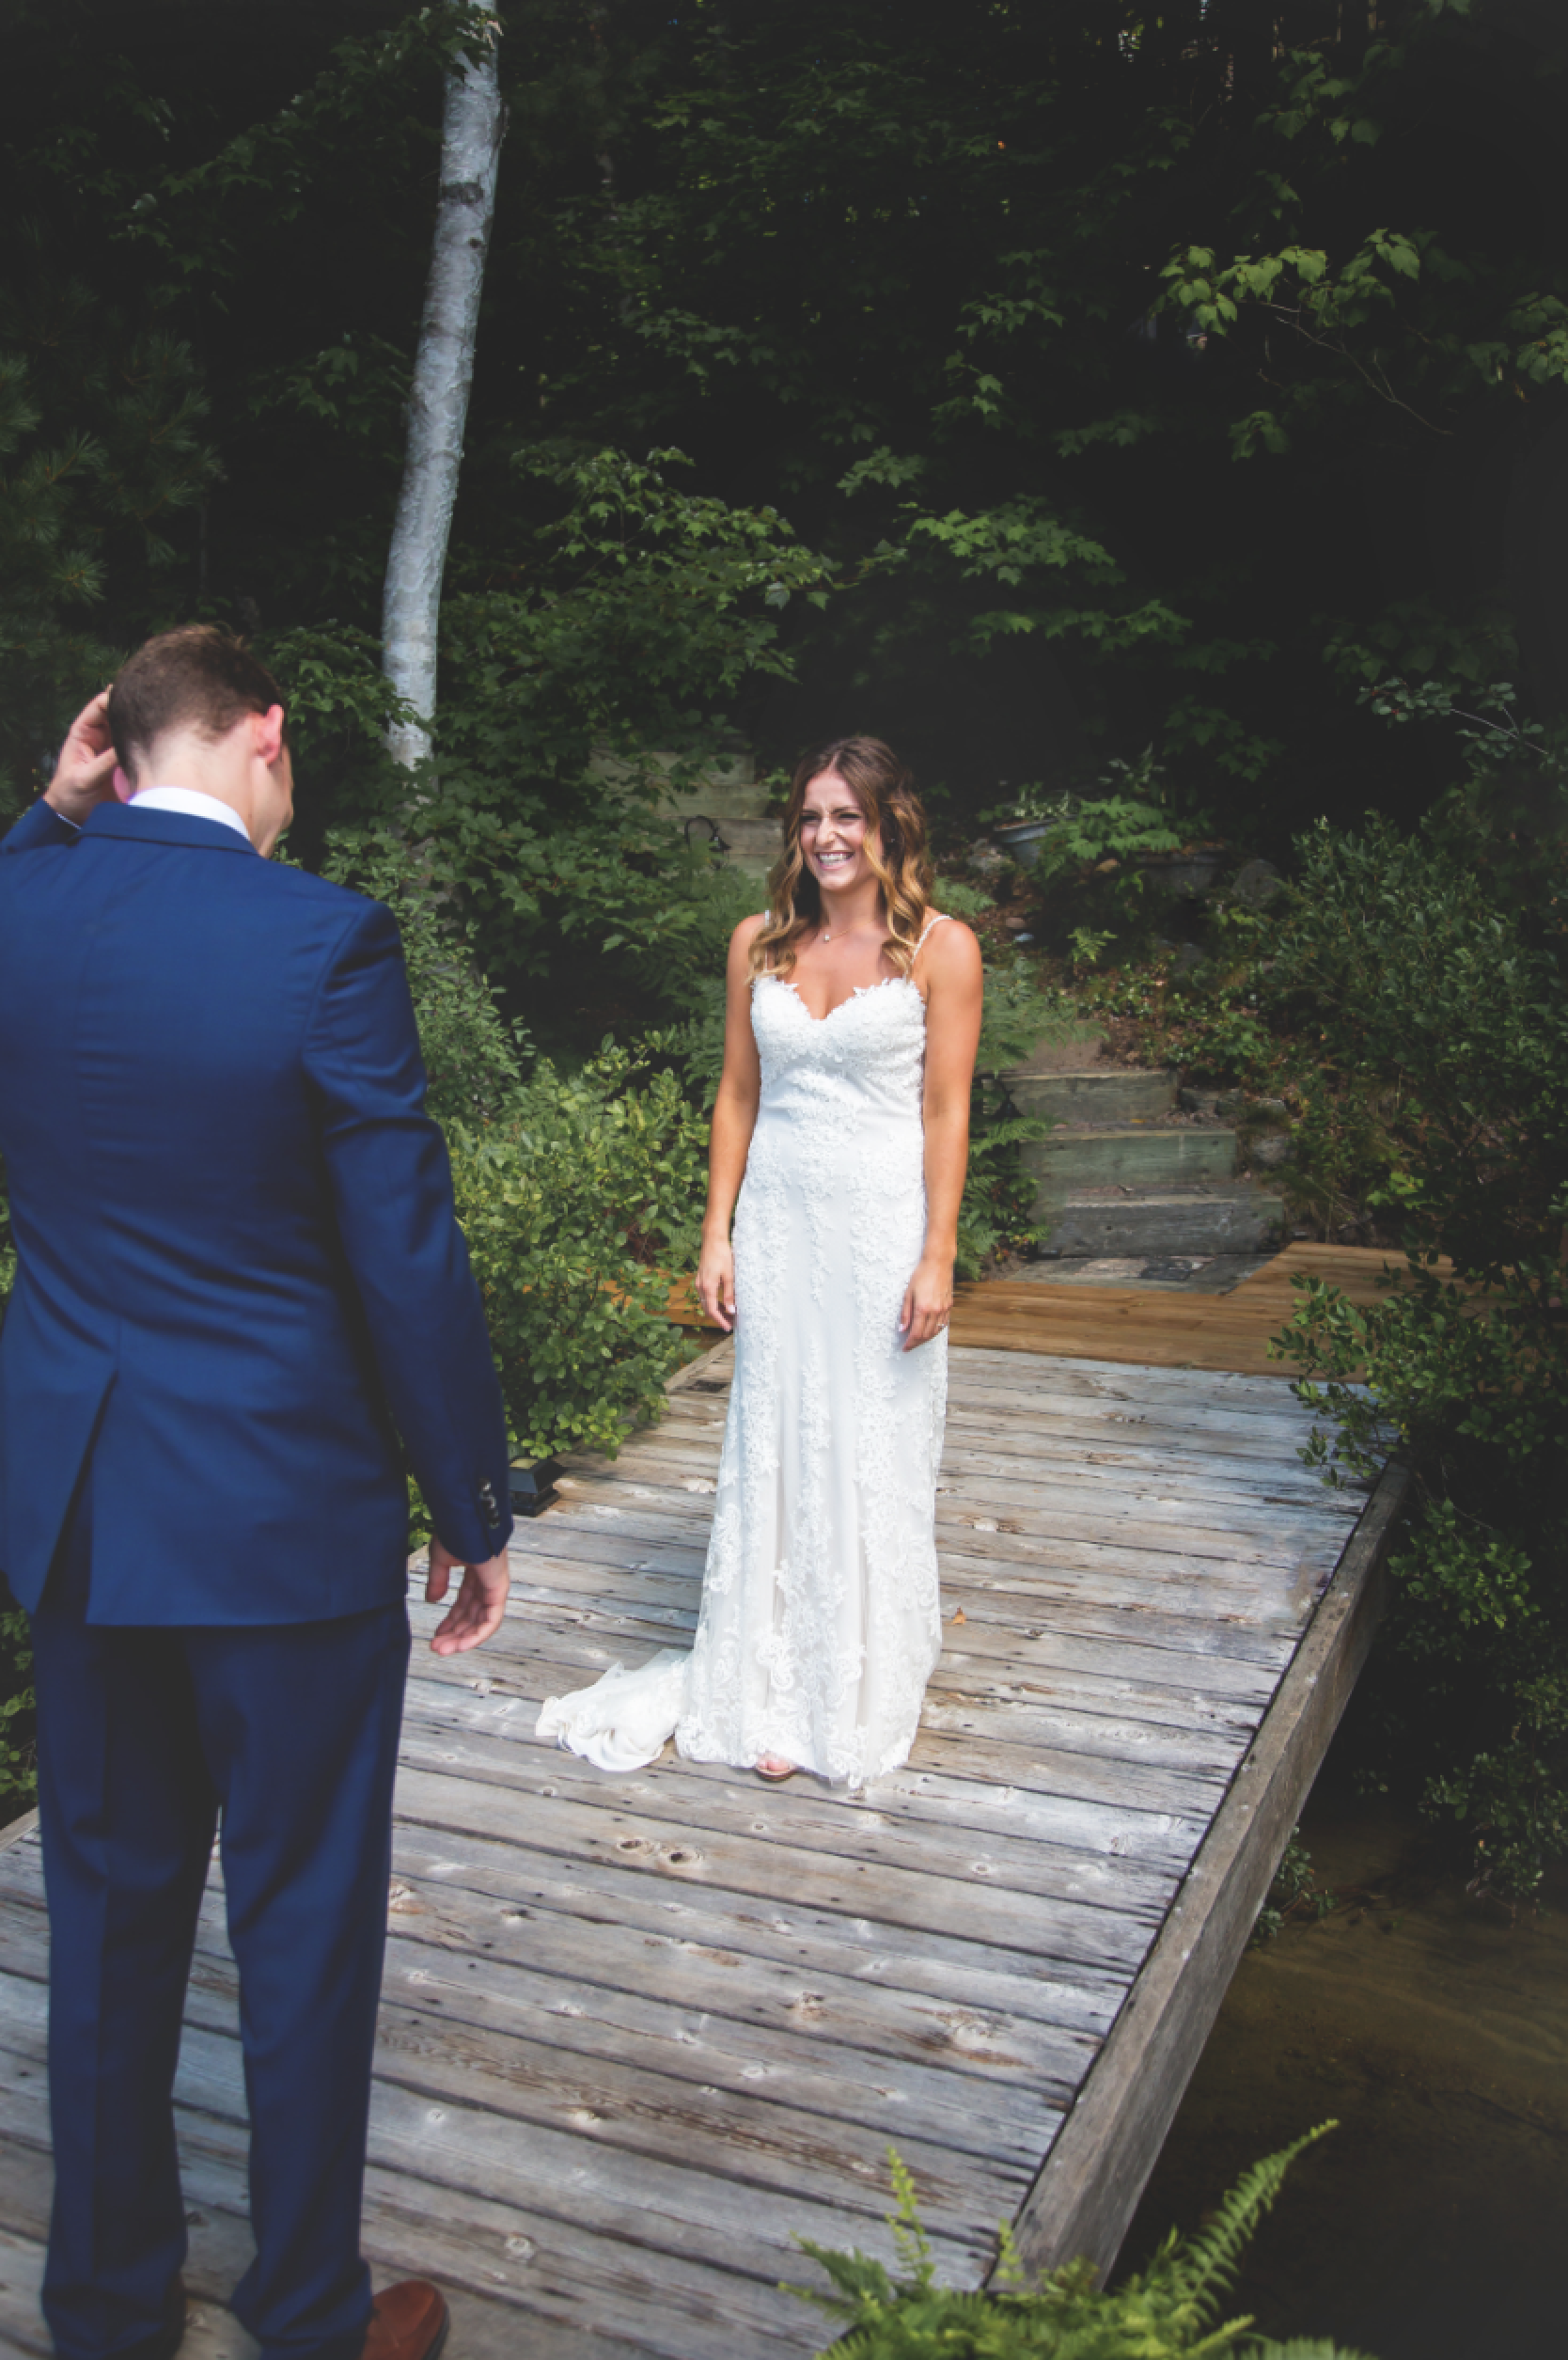 Wedding-Photos-Muskoka-Clevelands-House-Photographer-Wedding-Hamilton-GTA-Niagara-Oakville-Moments-by-Lauren-Photography-Photo-Image-24.png